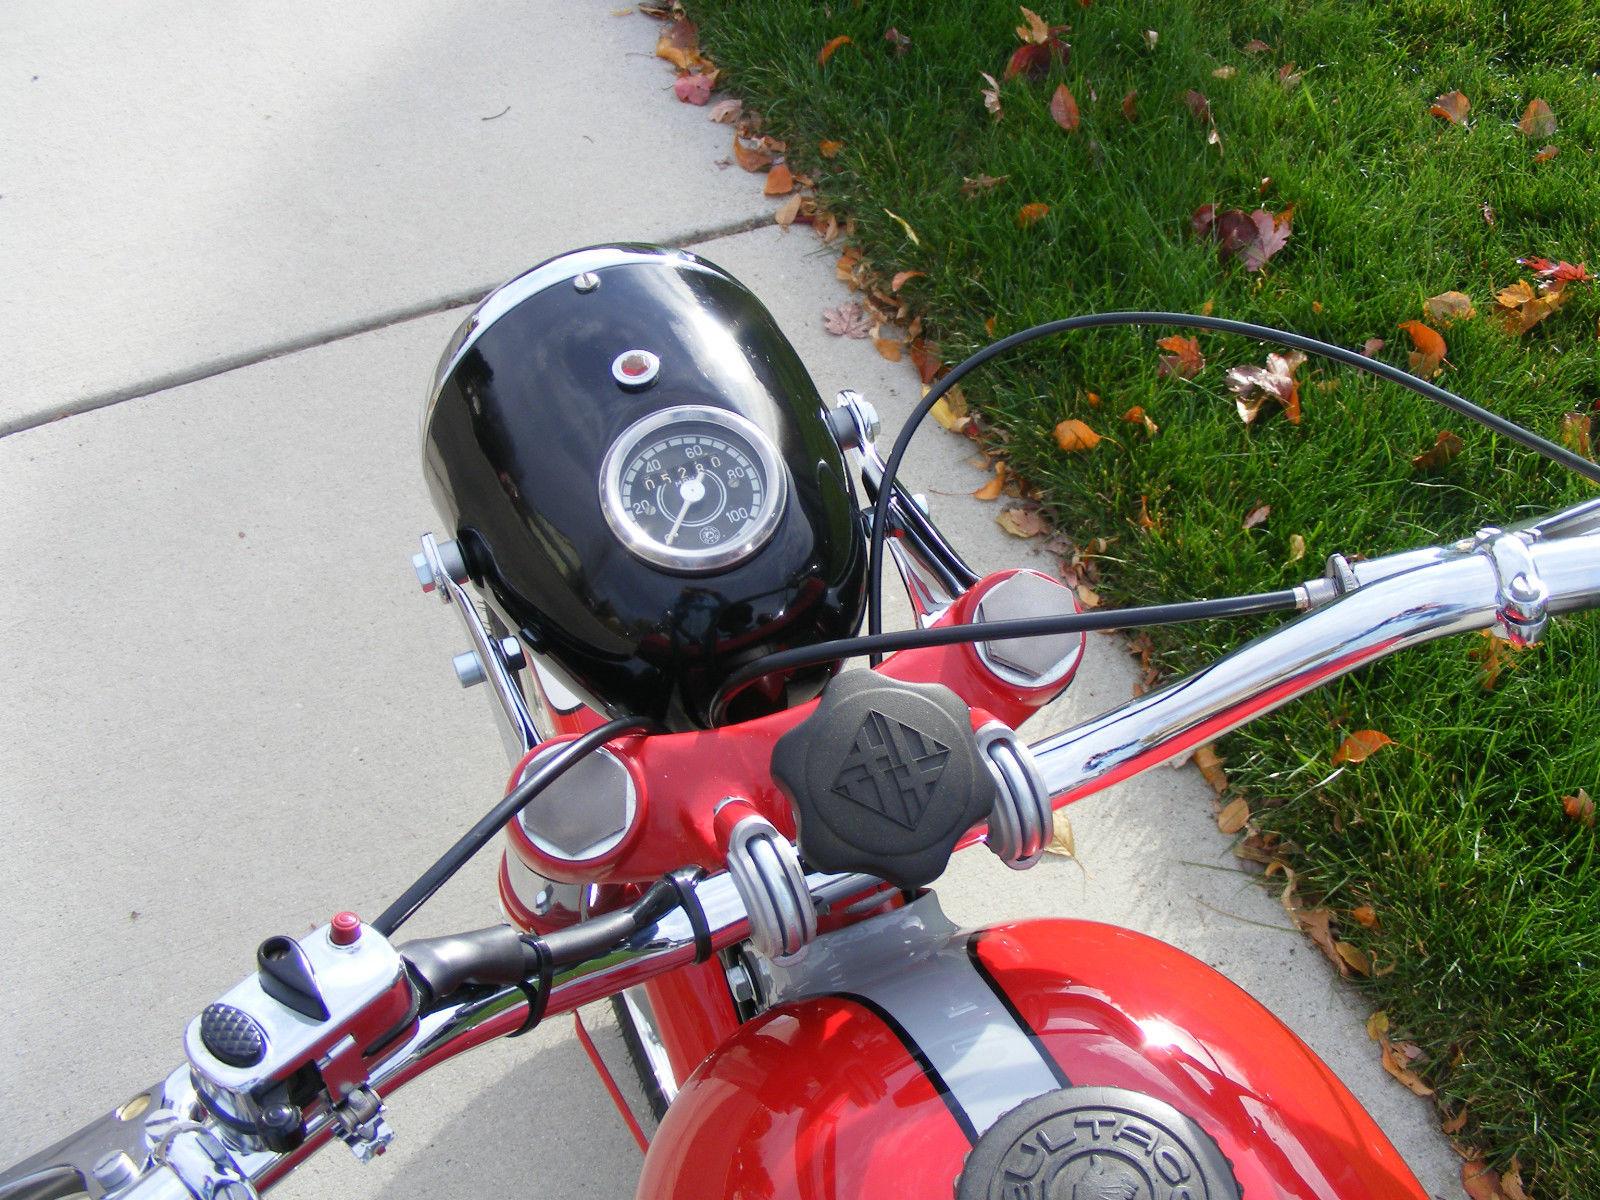 Bultaco Mercurio - 1966 - Steering Damper, Headlight and Speedo.